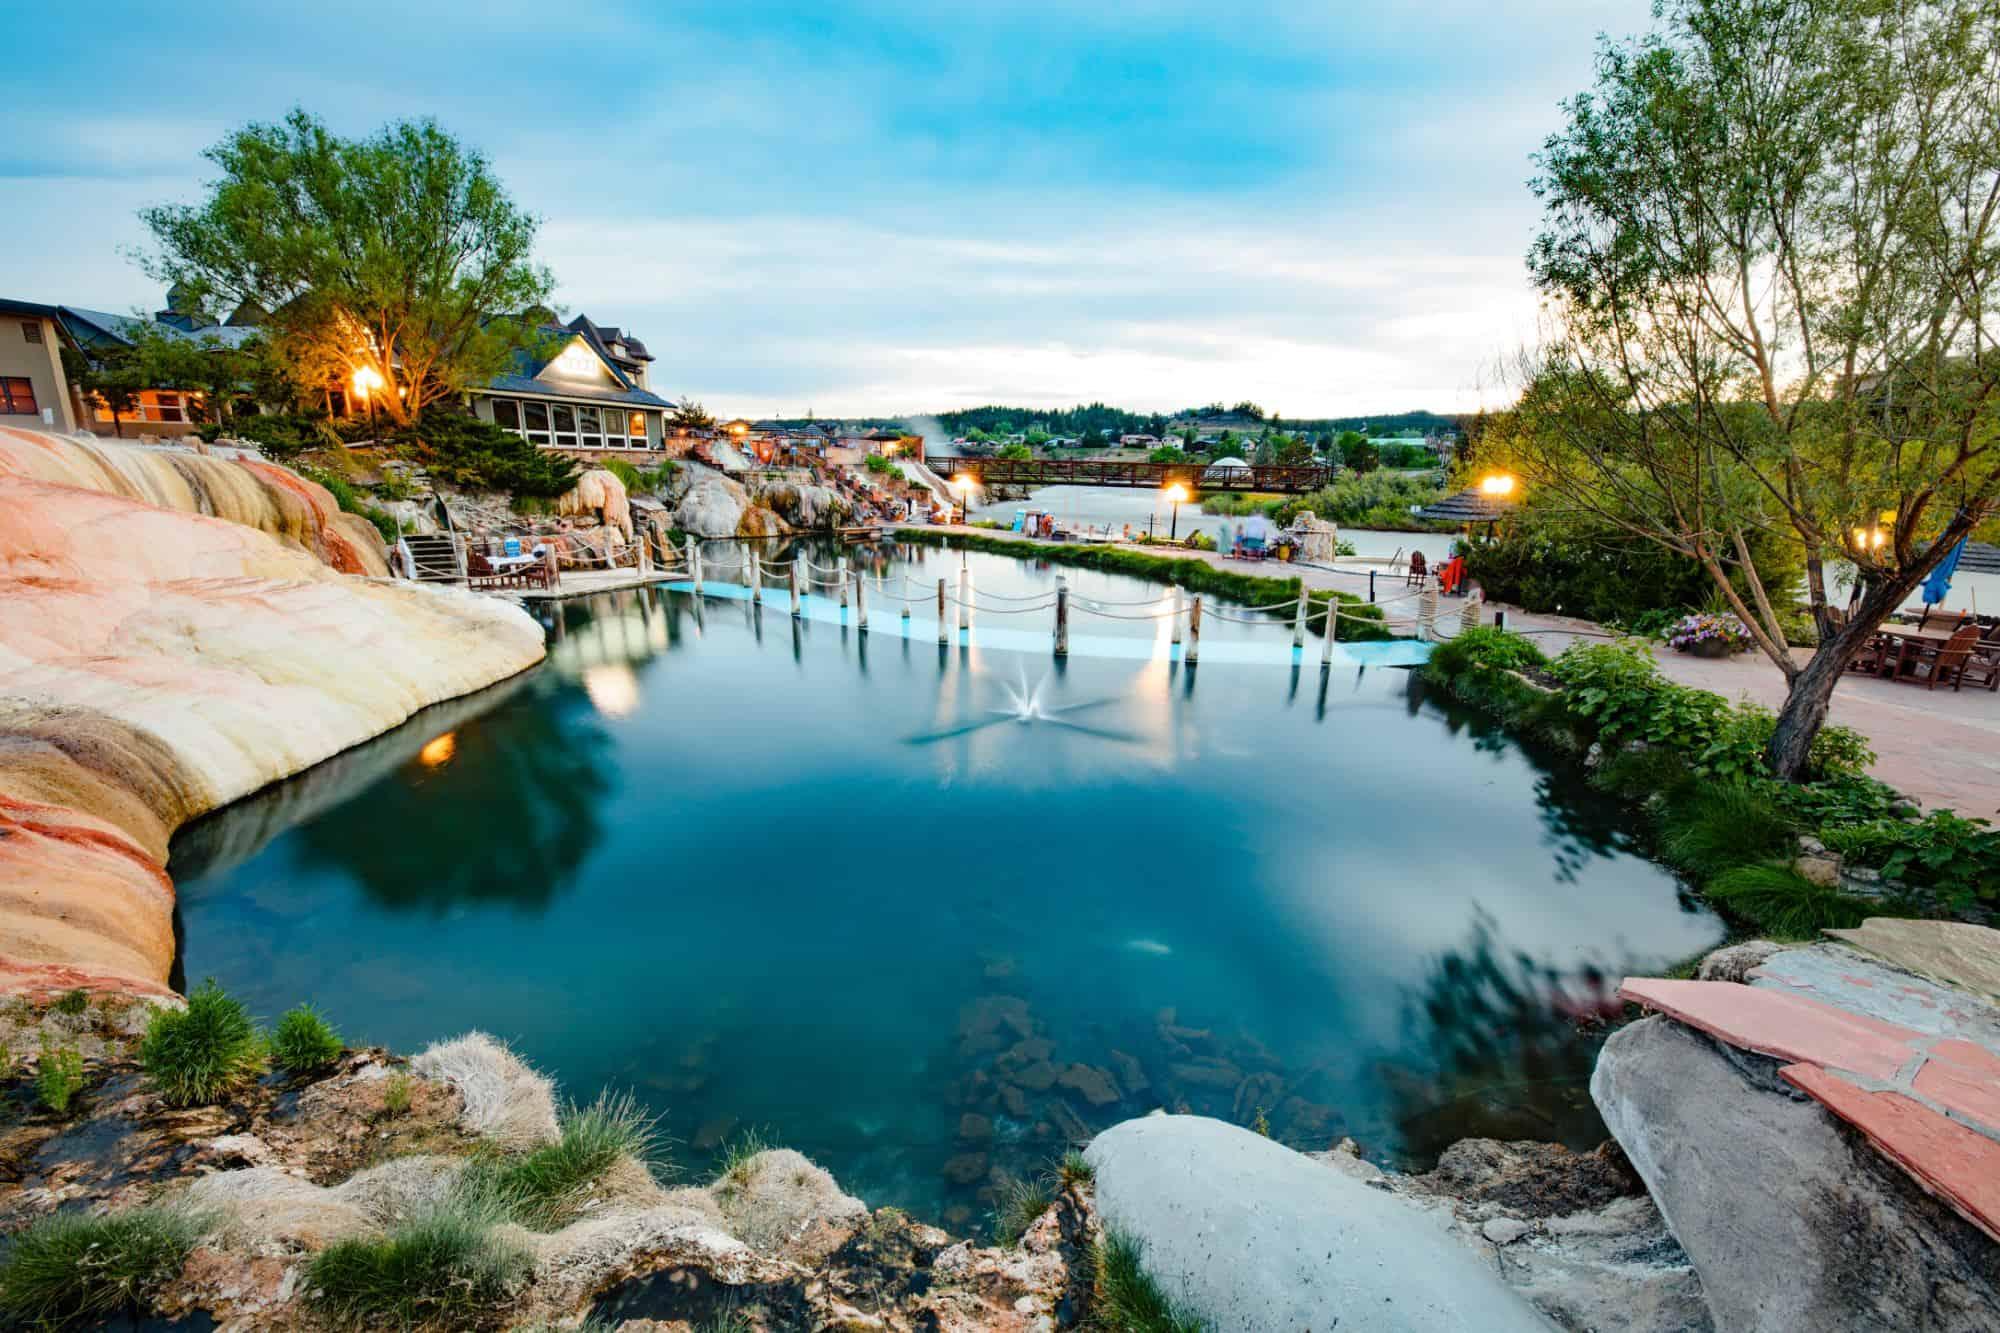 Image of hot springs resort in Pagosa Springs